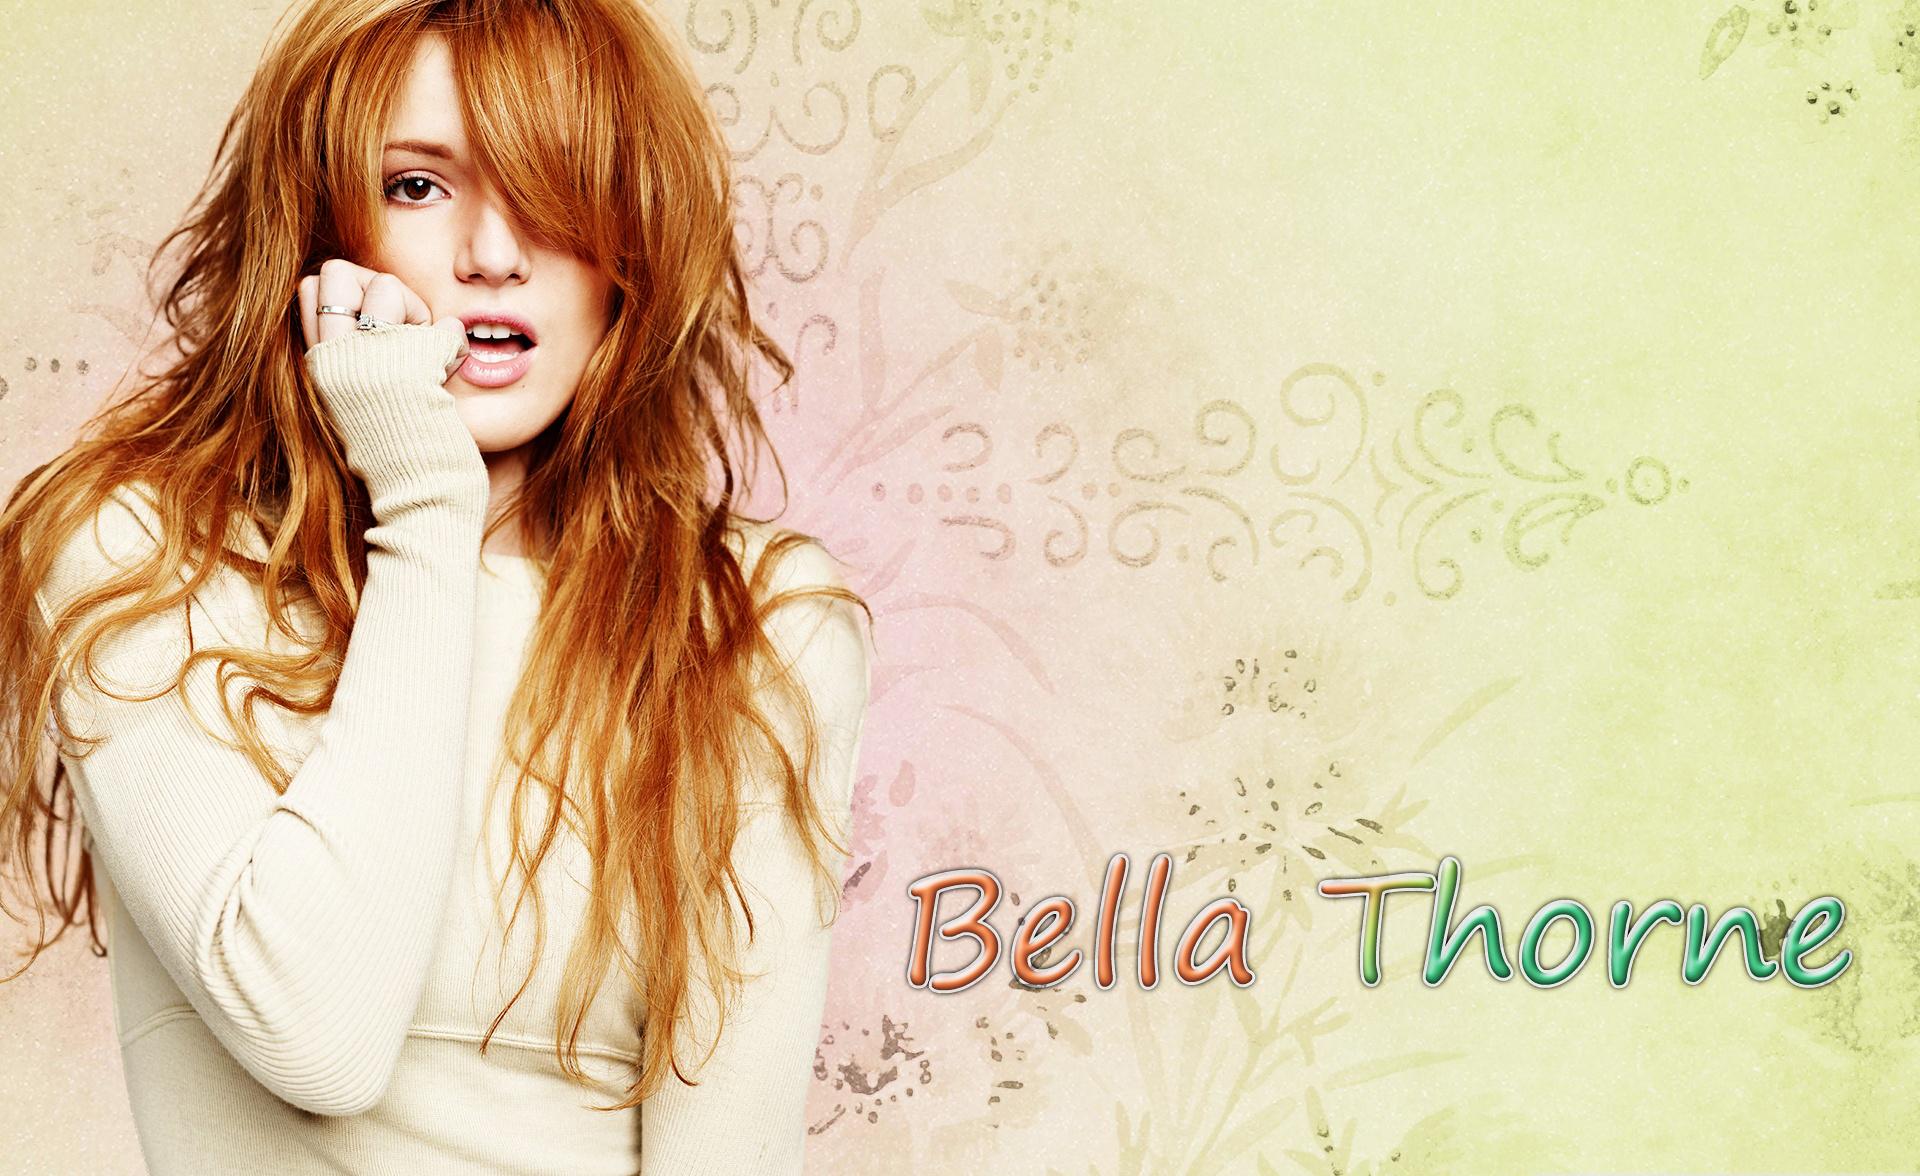 Saif Ali Khan Hd Wallpaper Facebook Covers For Bella Thorne Popopics Com